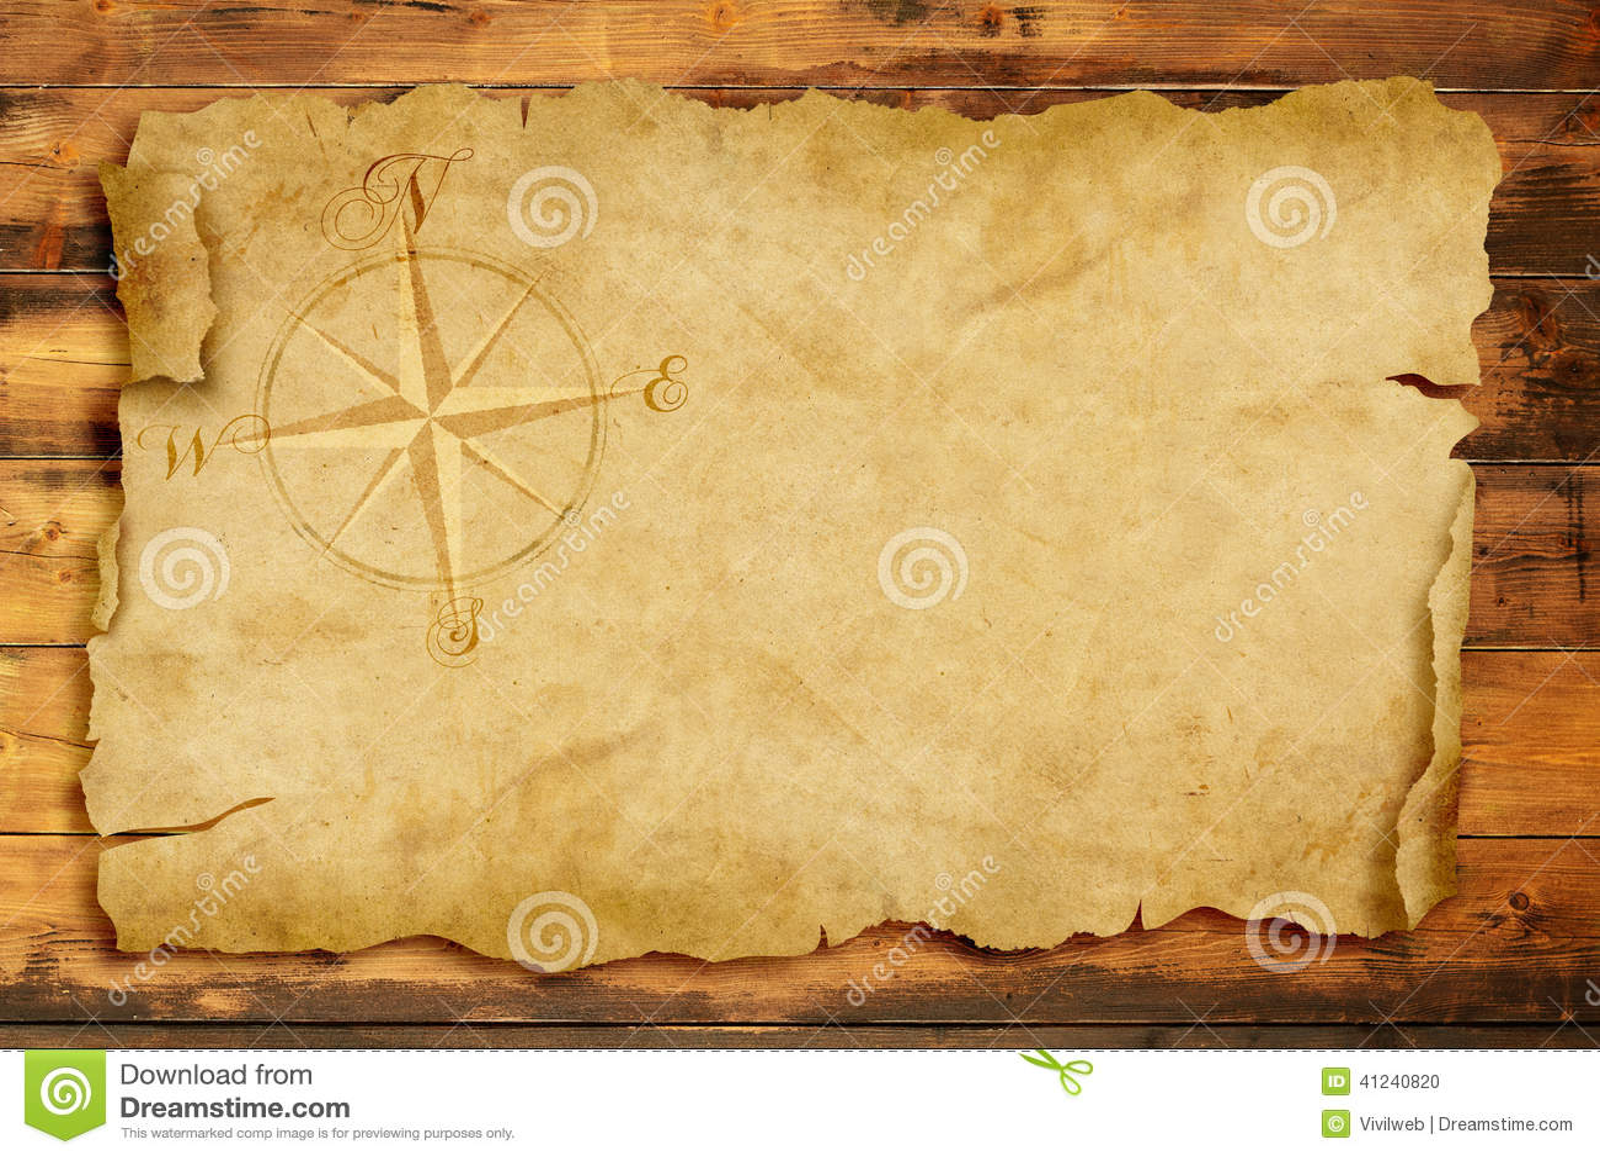 old nautical chart stock illustration  image of document